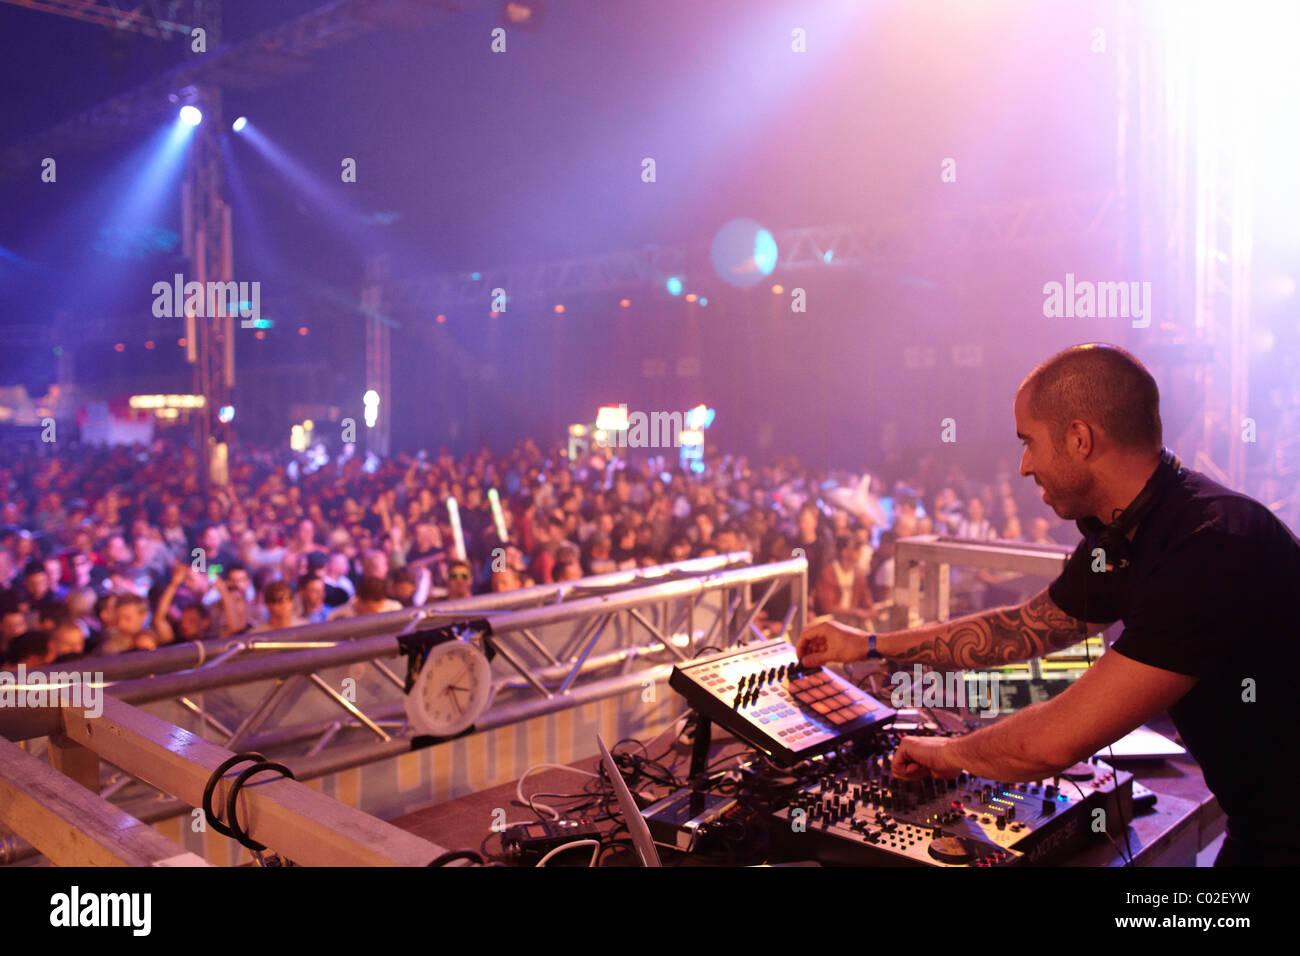 DJ Chris Liebing, Techno festival Naturaleza 2010, Kastellaun, Renania-Palatinado, Alemania, Europa Foto de stock